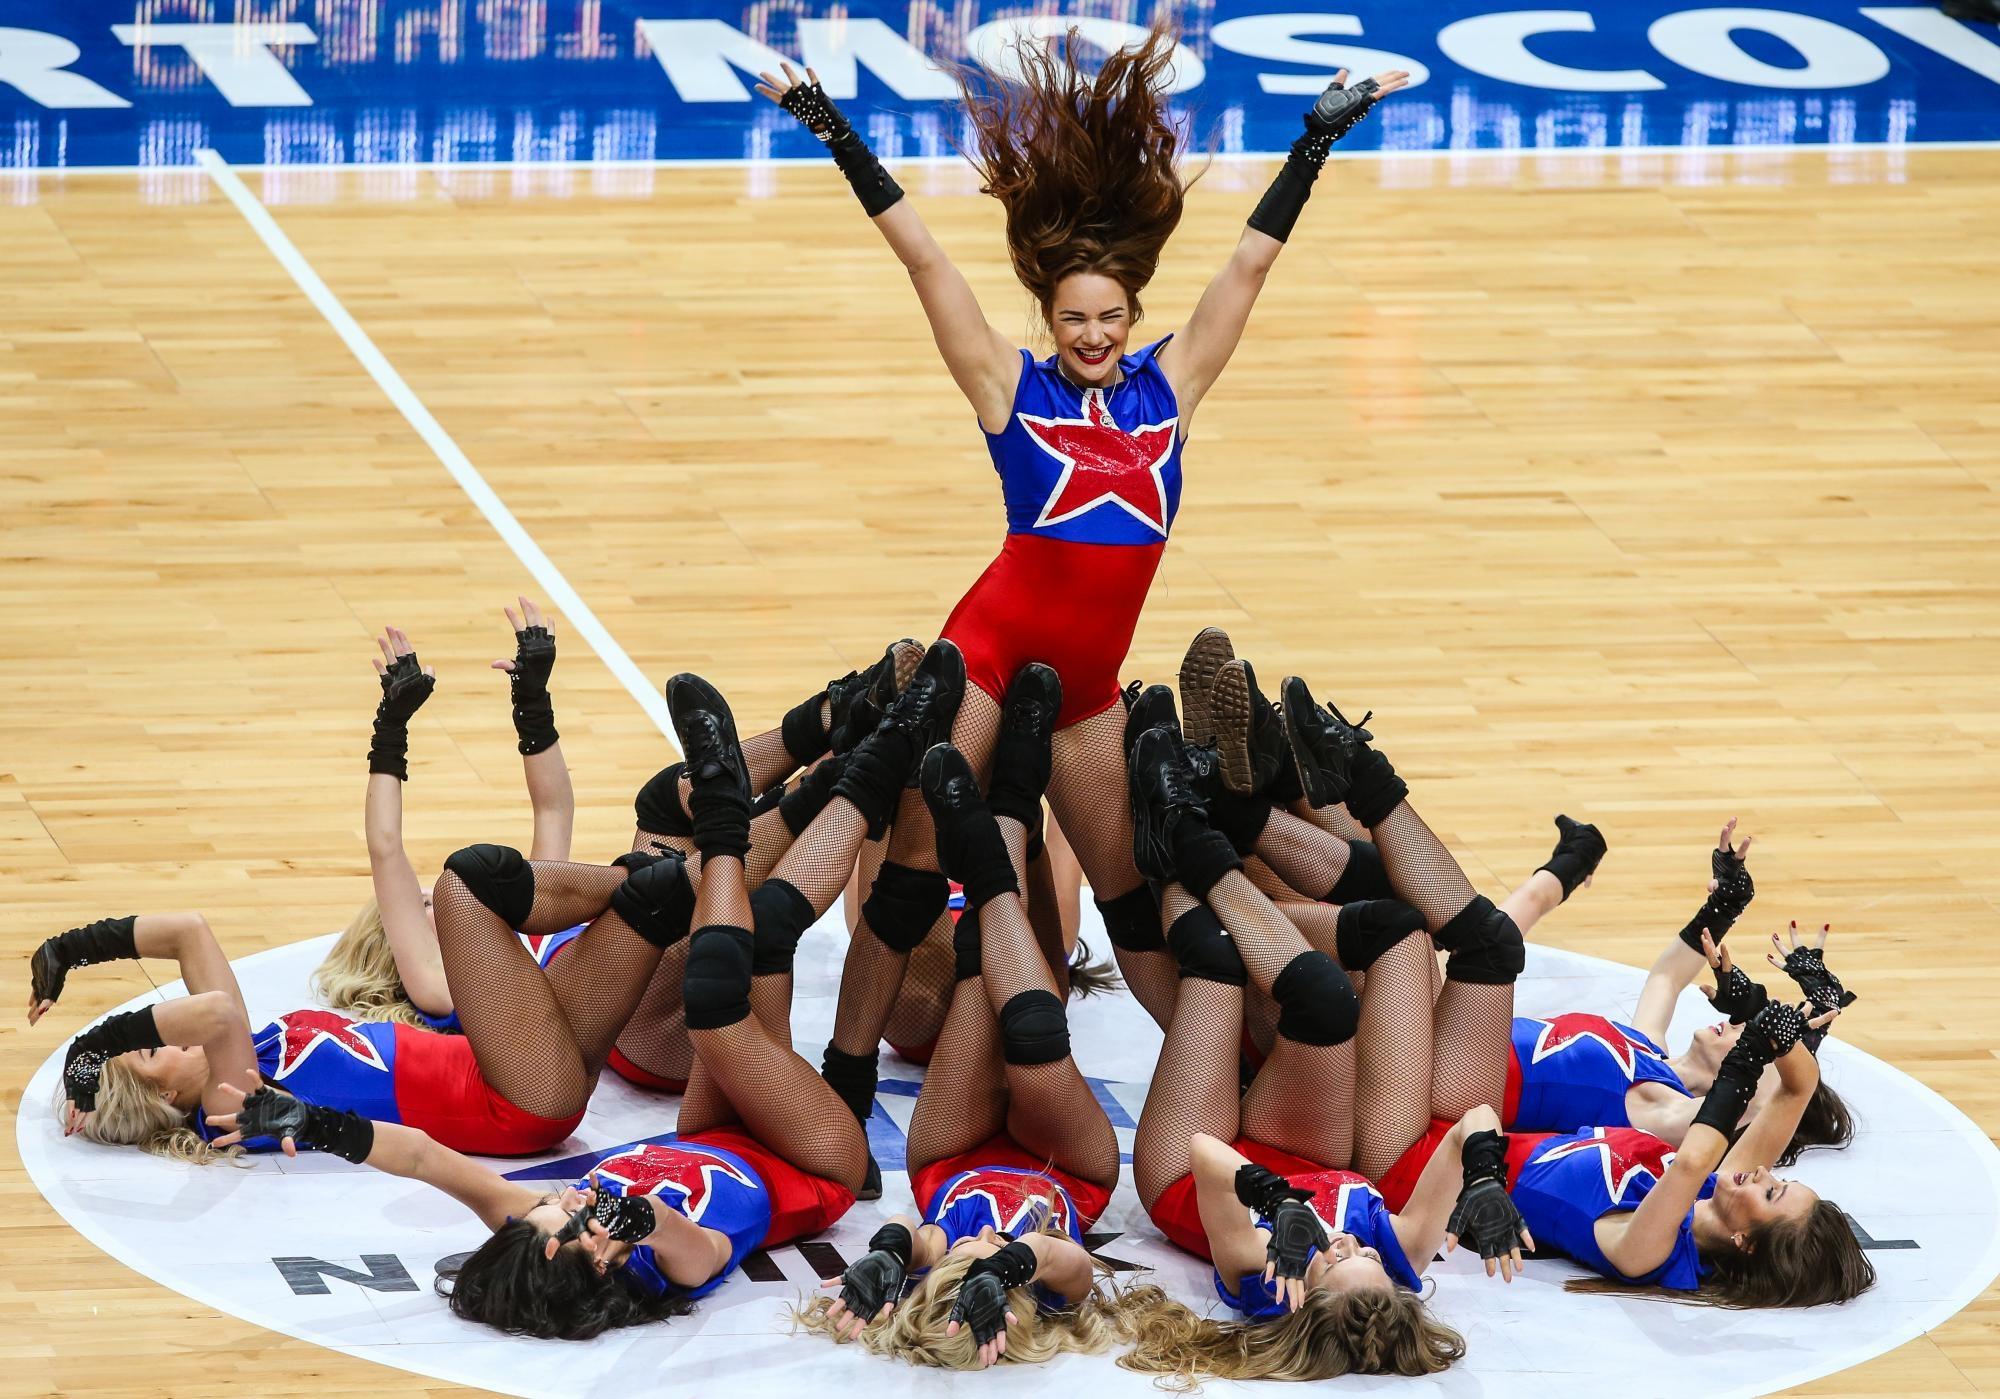 хоккея группа поддержки цска баскетбол фото джобс